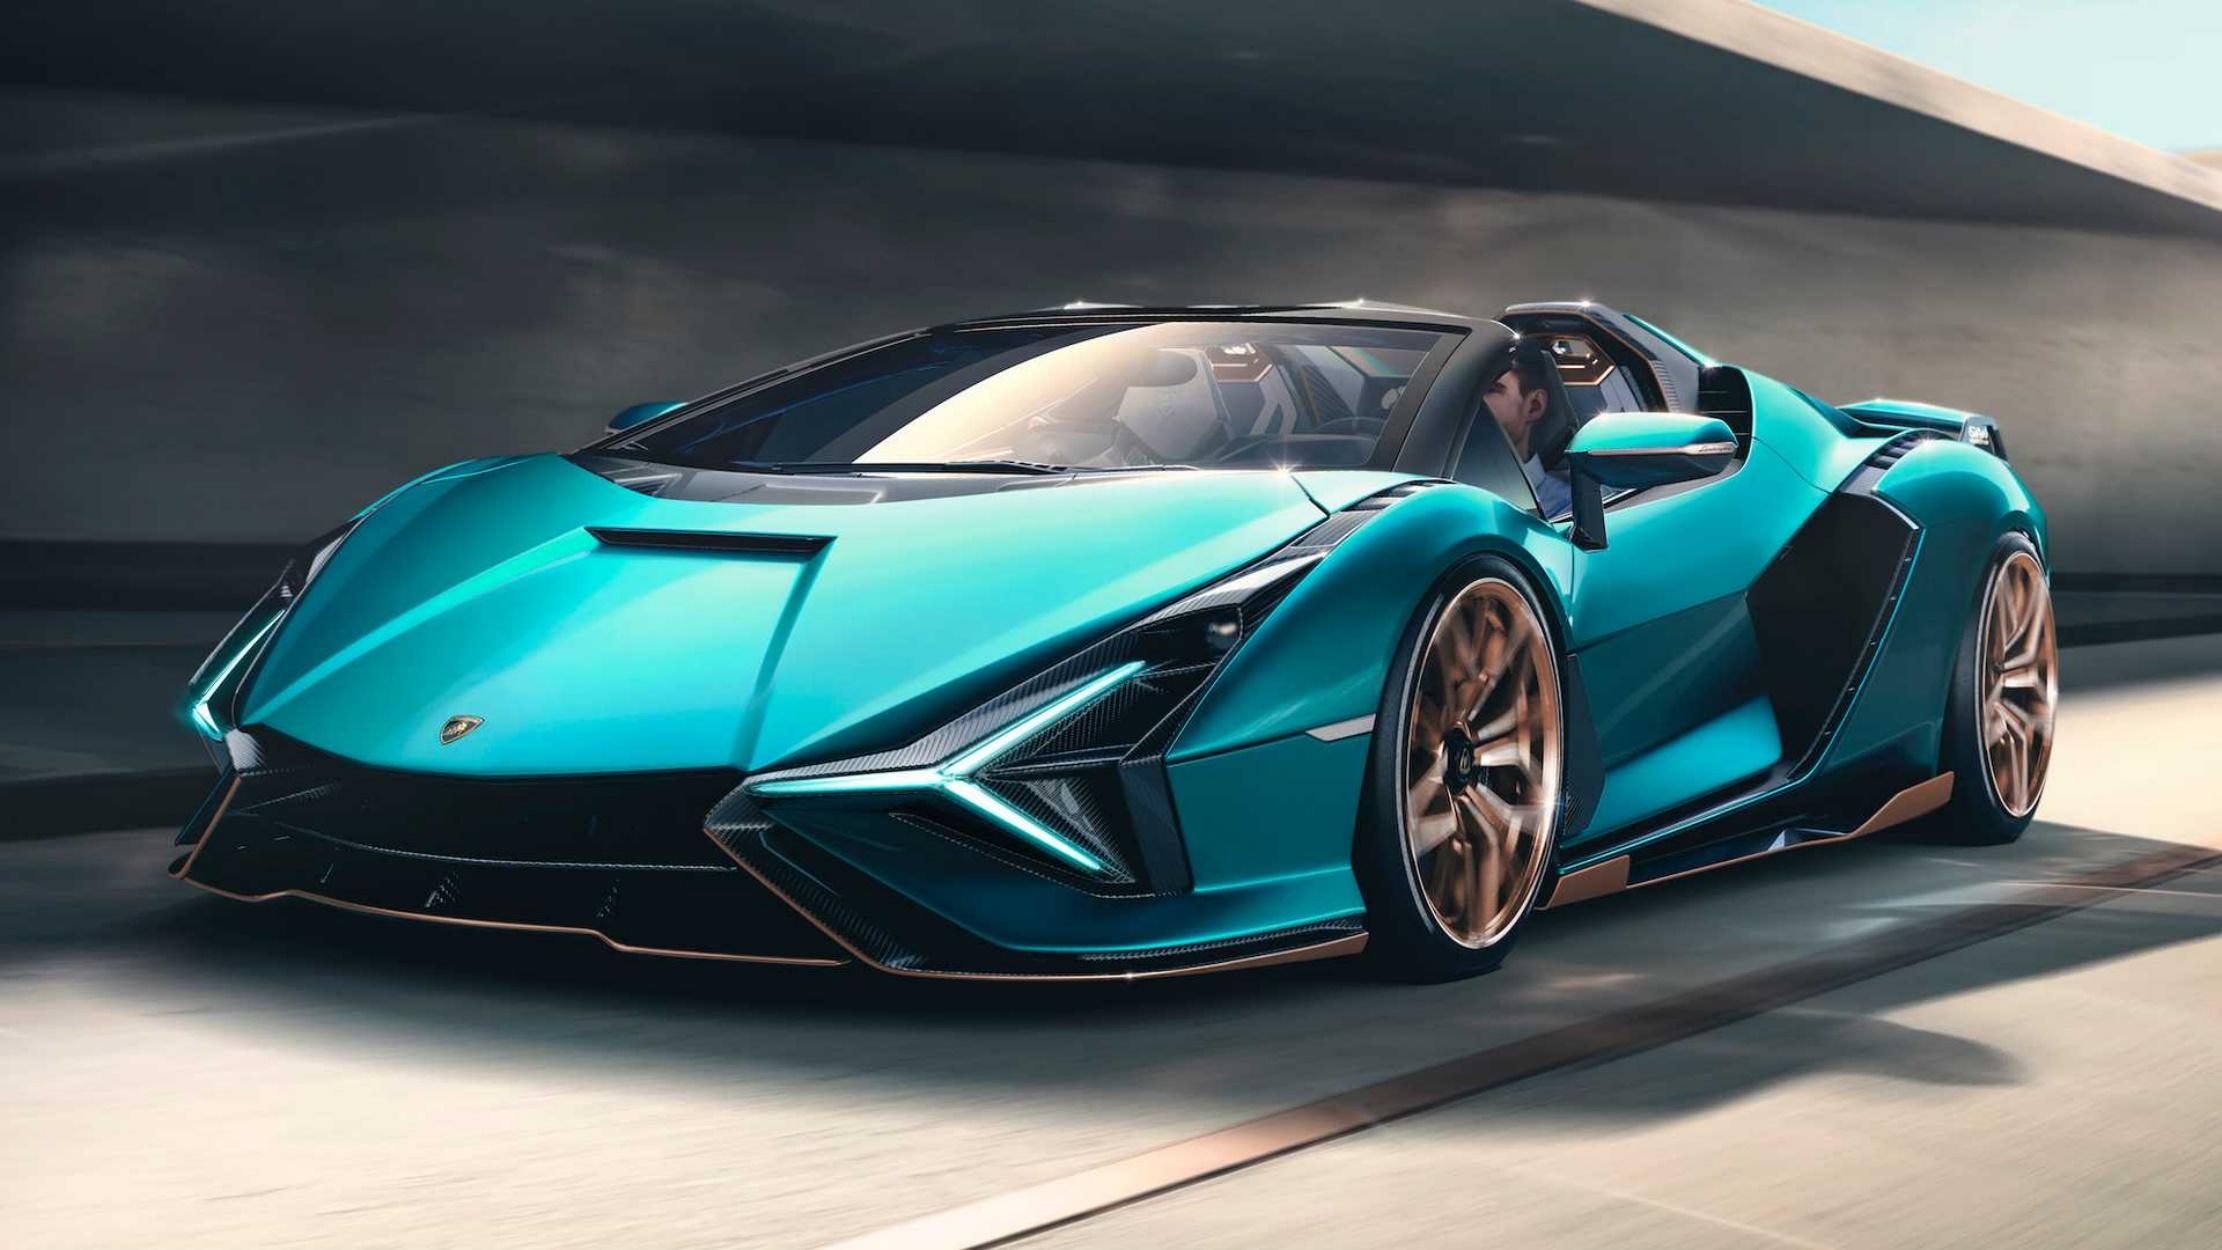 Lamborghini Sian Roadster: Εντυπωσιακή και σπάνια